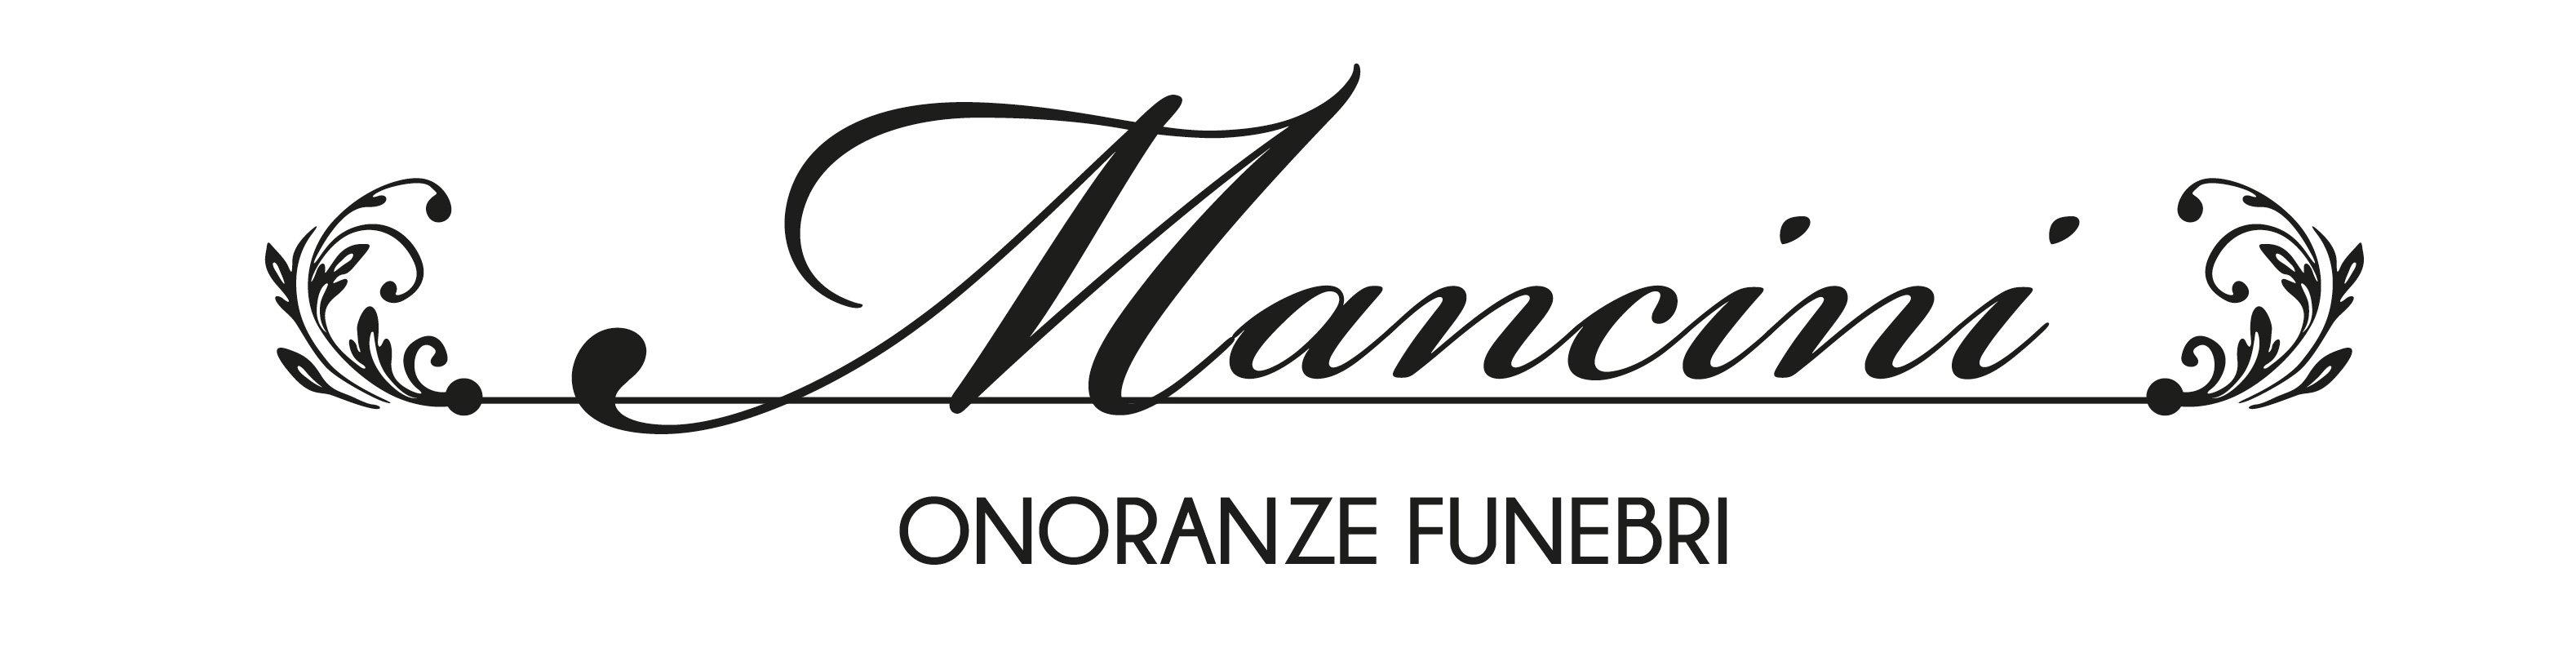 Onoranze Funebri Mancini - Logo